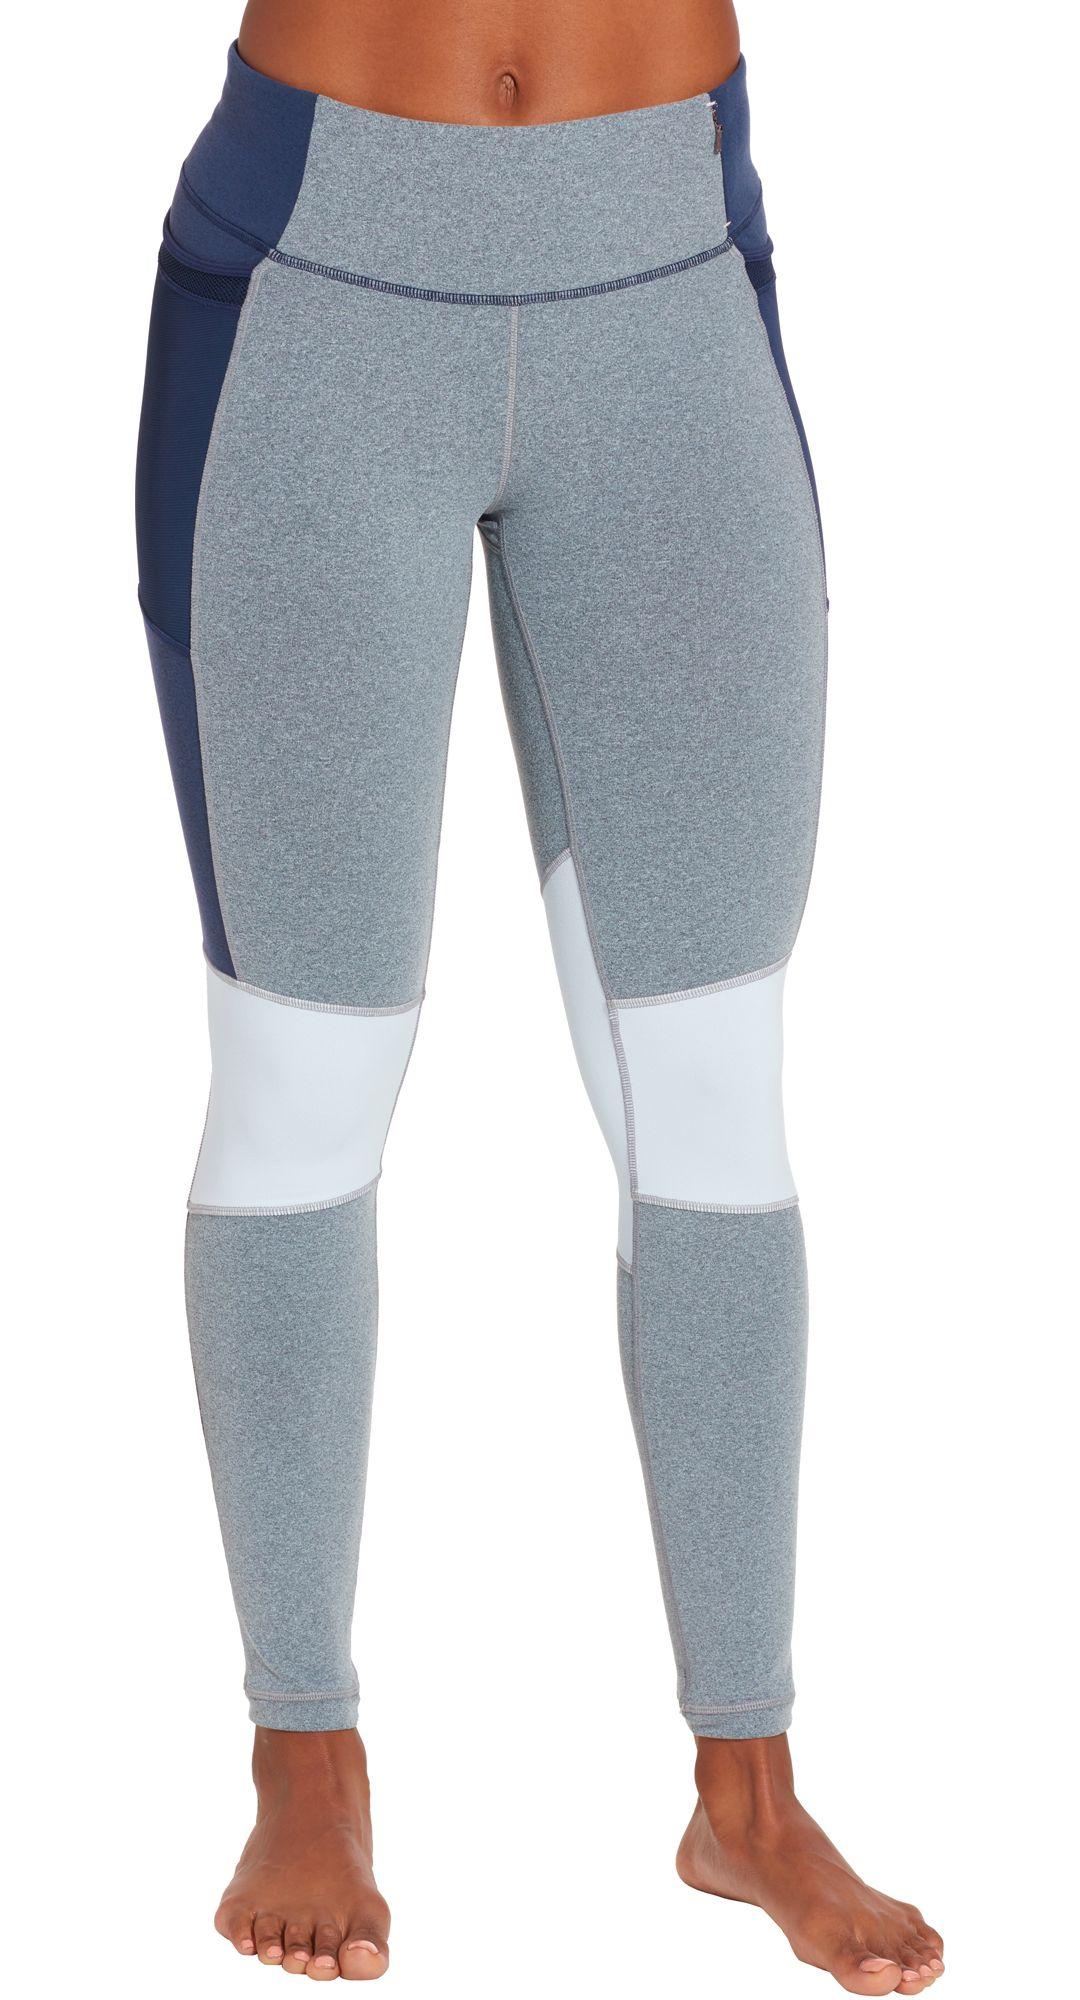 ec0940adb8 CALIA by Carrie Underwood Women's Essential Mesh Trim Leggings ...